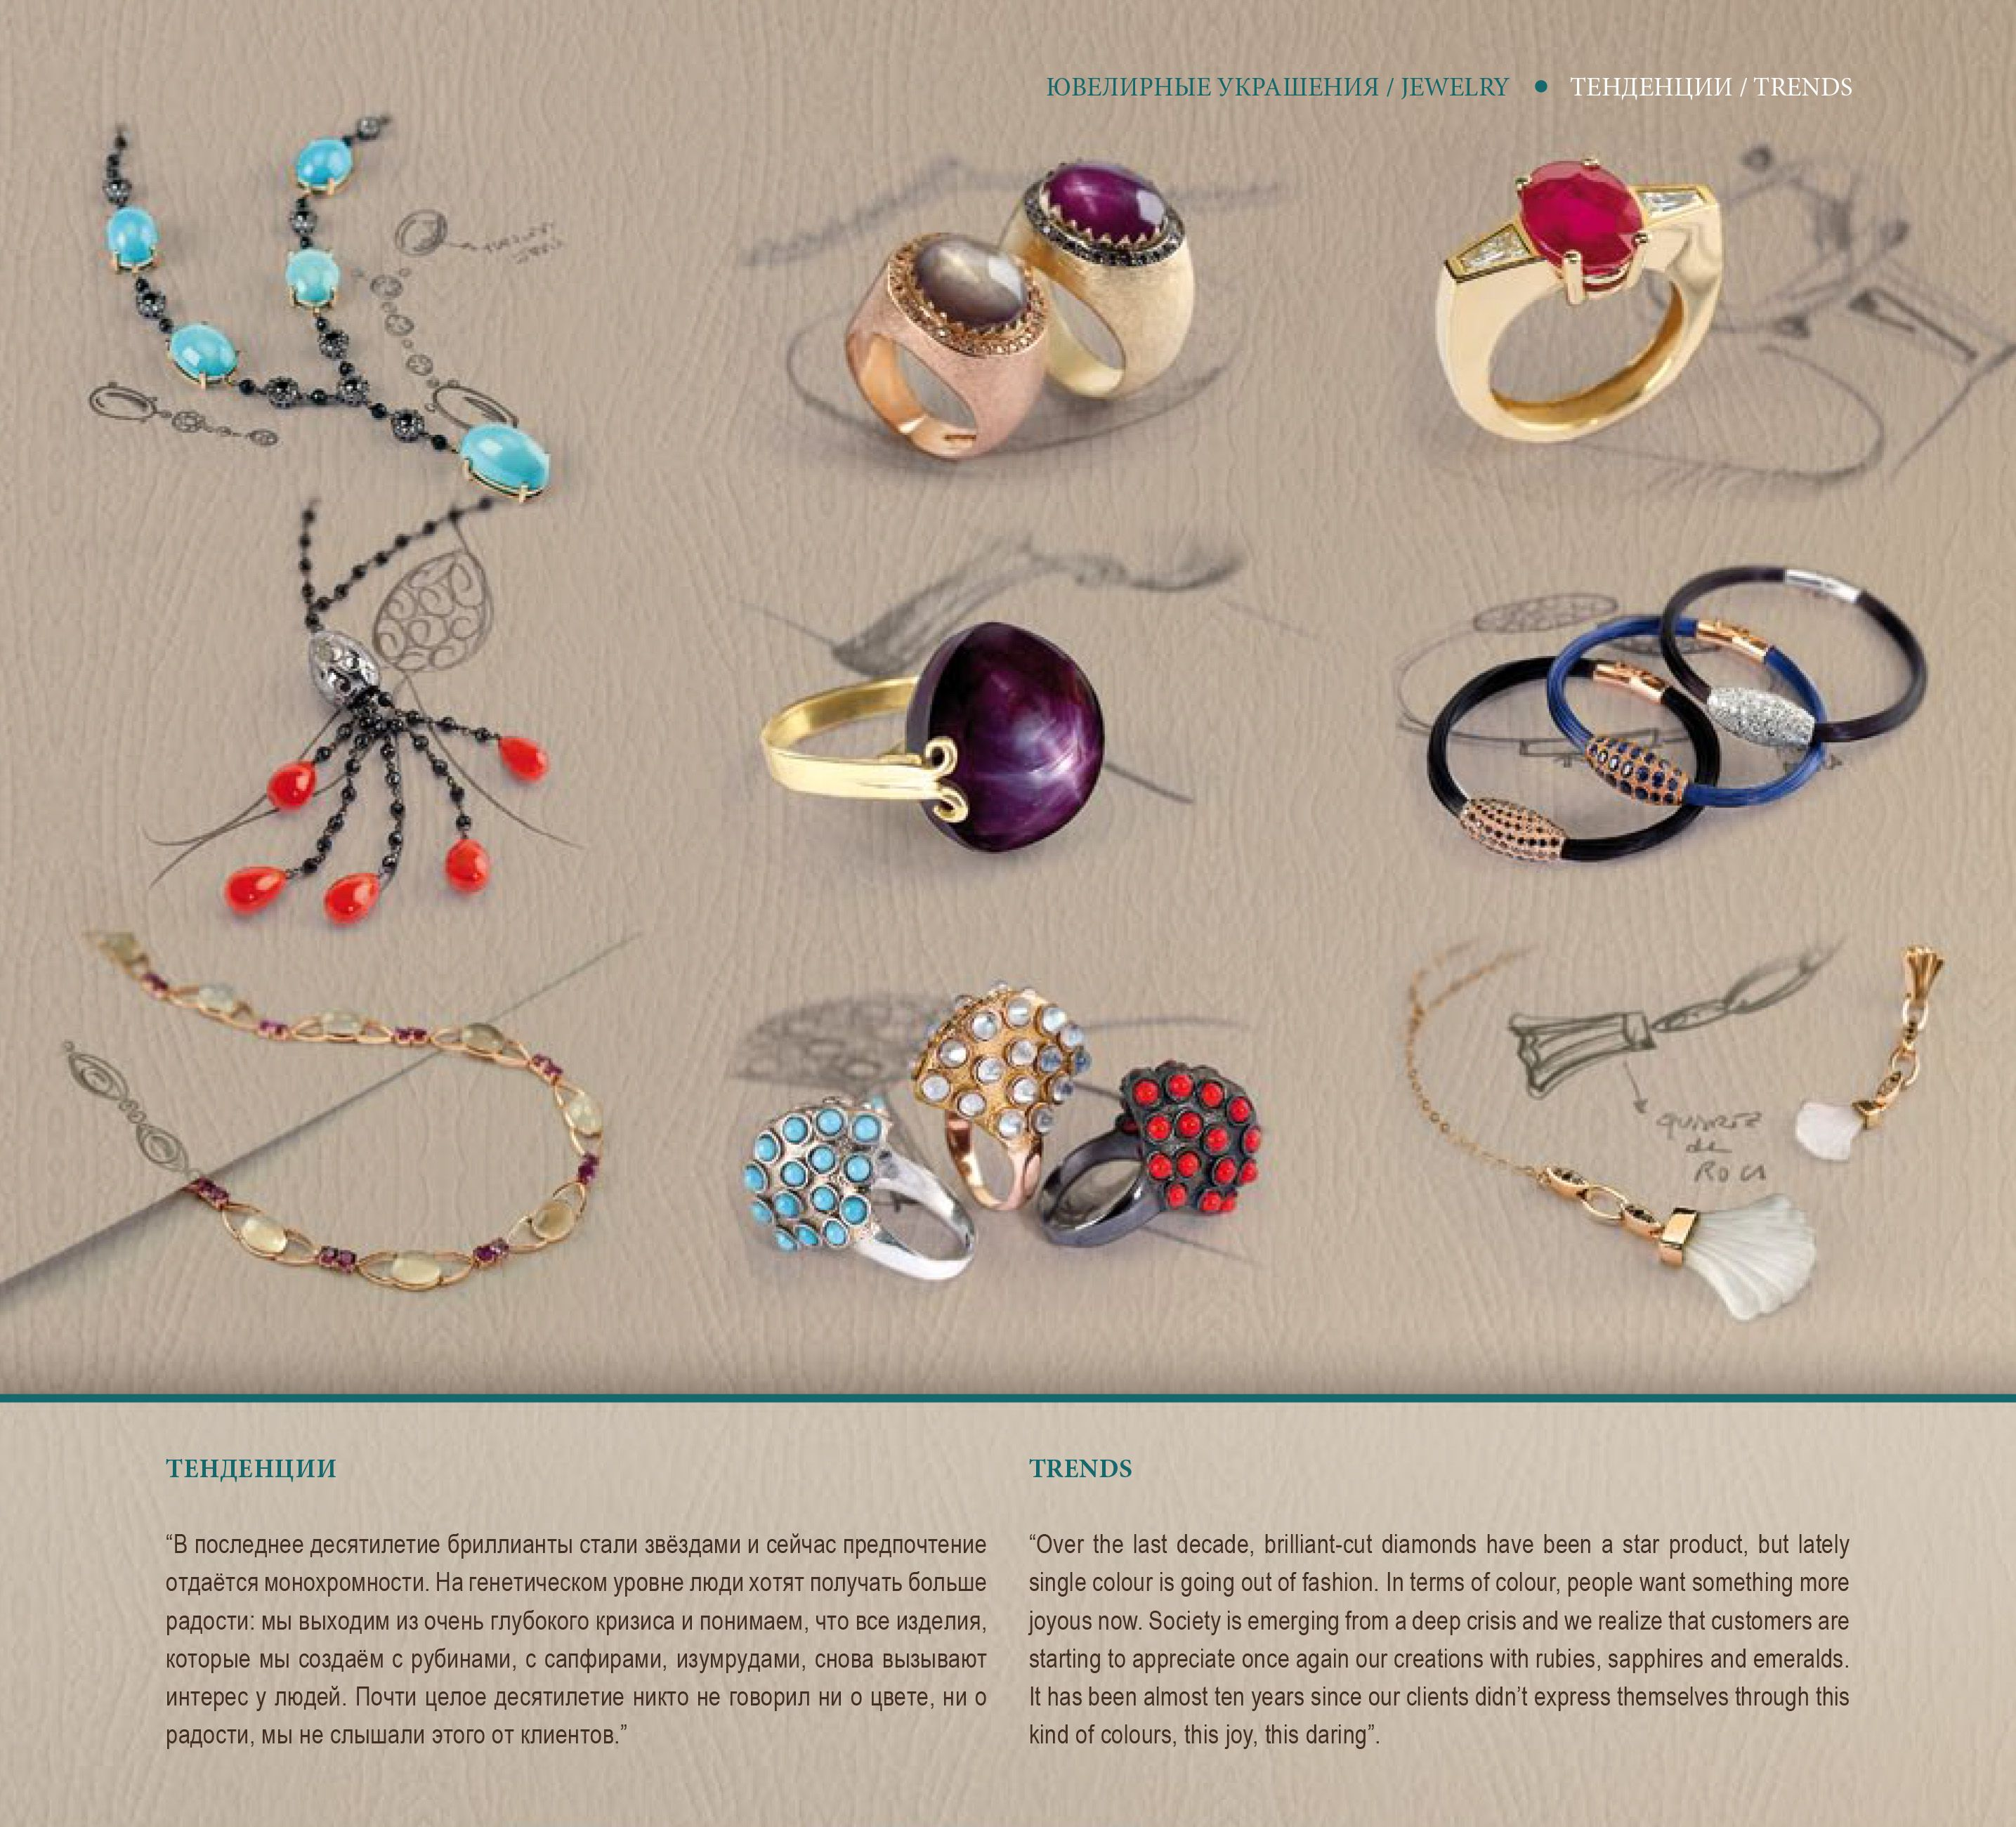 J. Roca Joyero  |  The customer seeks exclusivity   |   www.b-stylemagazine.com